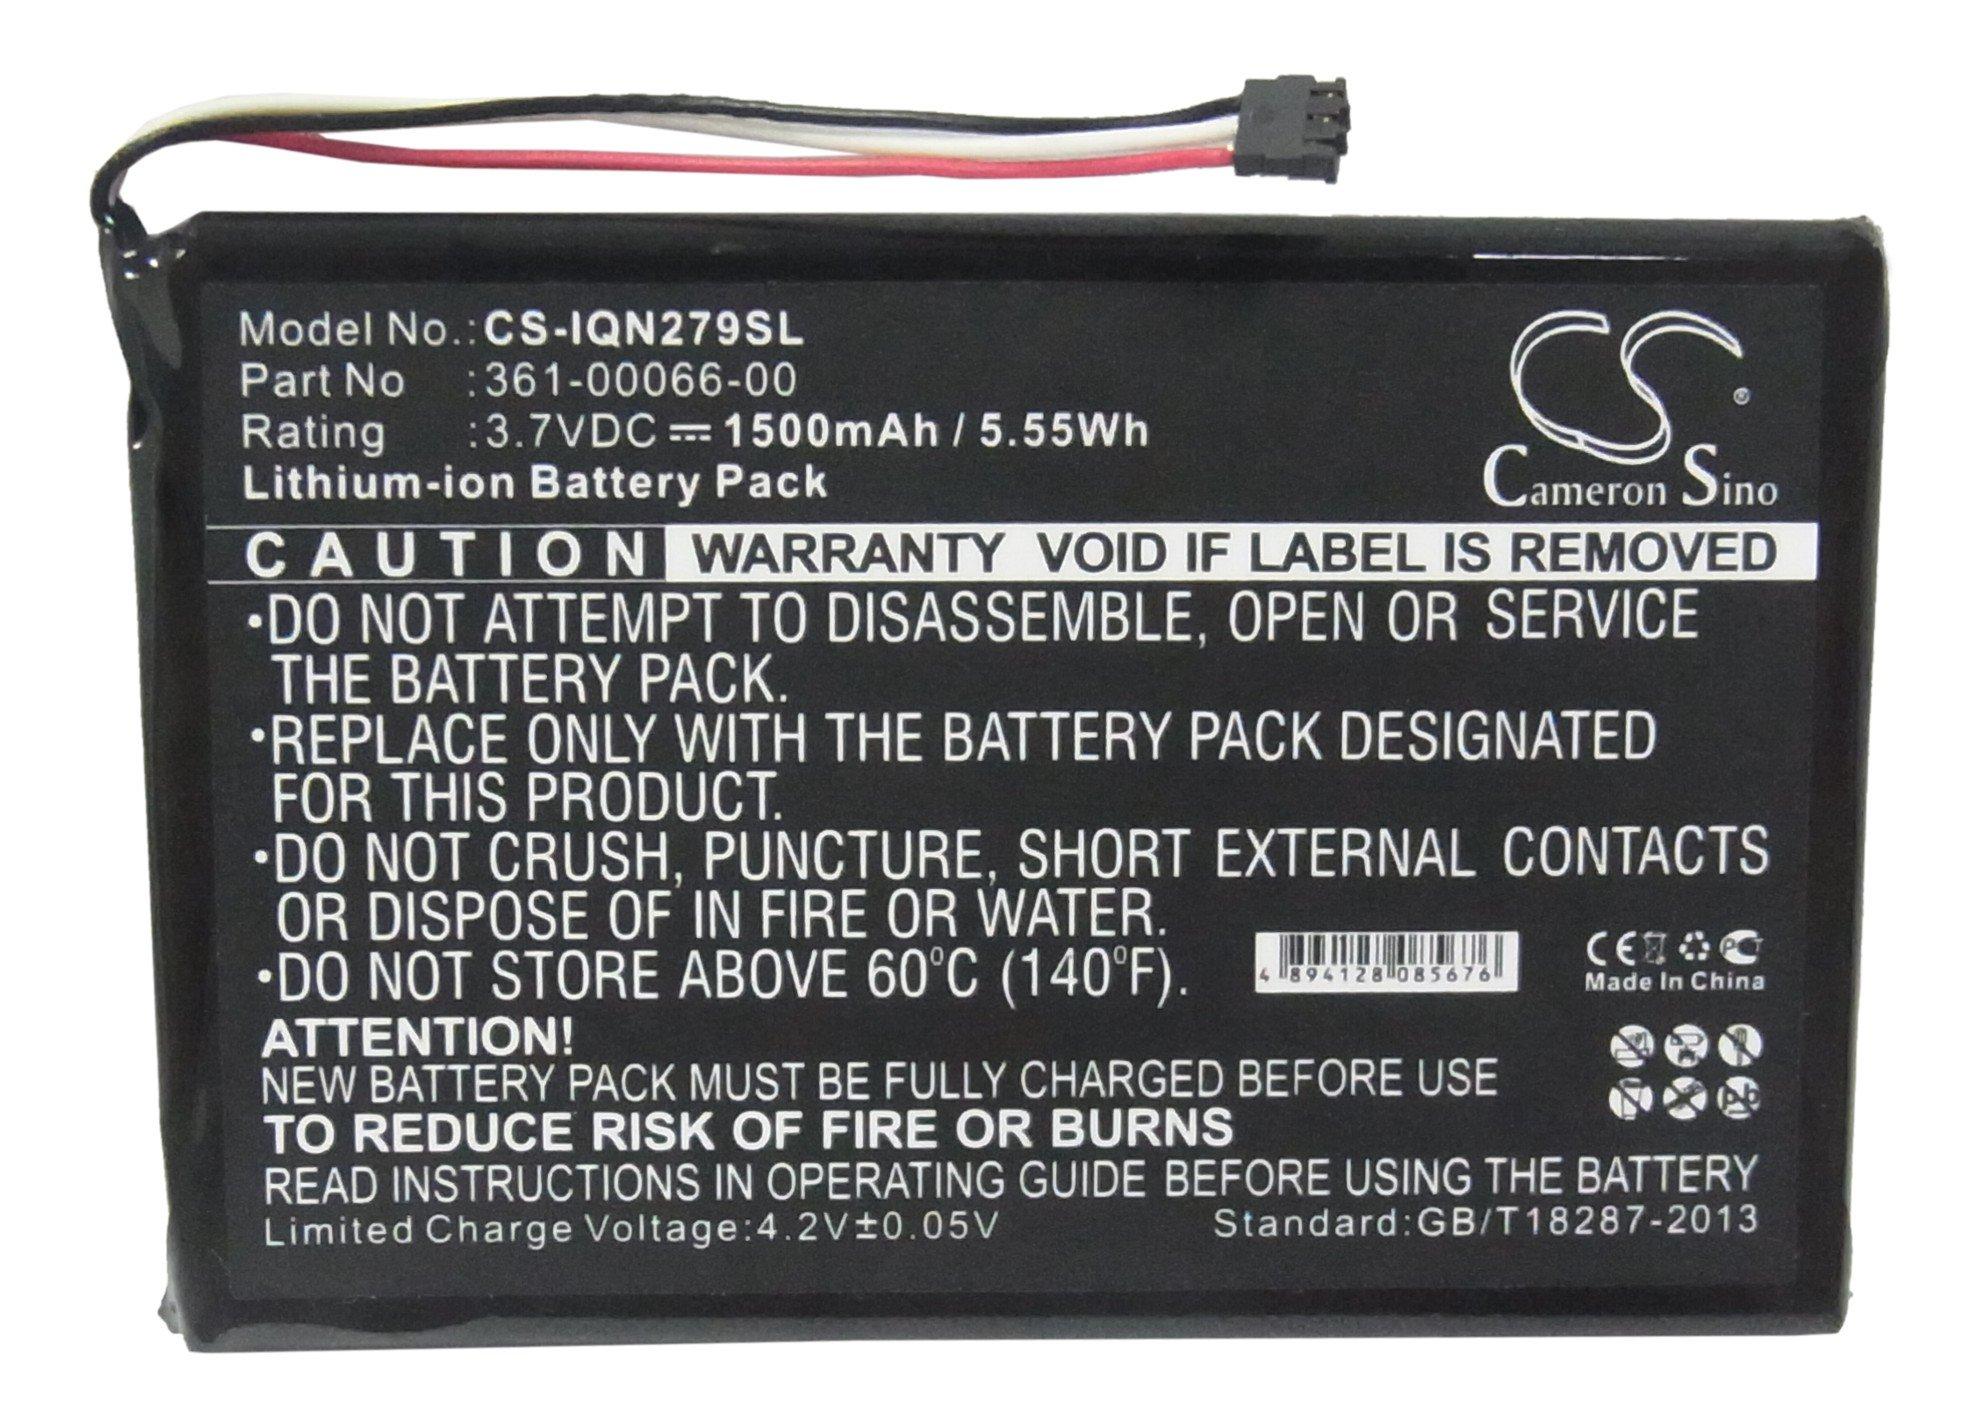 Replacement Battery for Garmin 361-00066-00, Fit Garmin Nuvi 2797,Nuvi 2757,3.70V,1500mAh,Li-ion by Cameron Sino (Image #1)